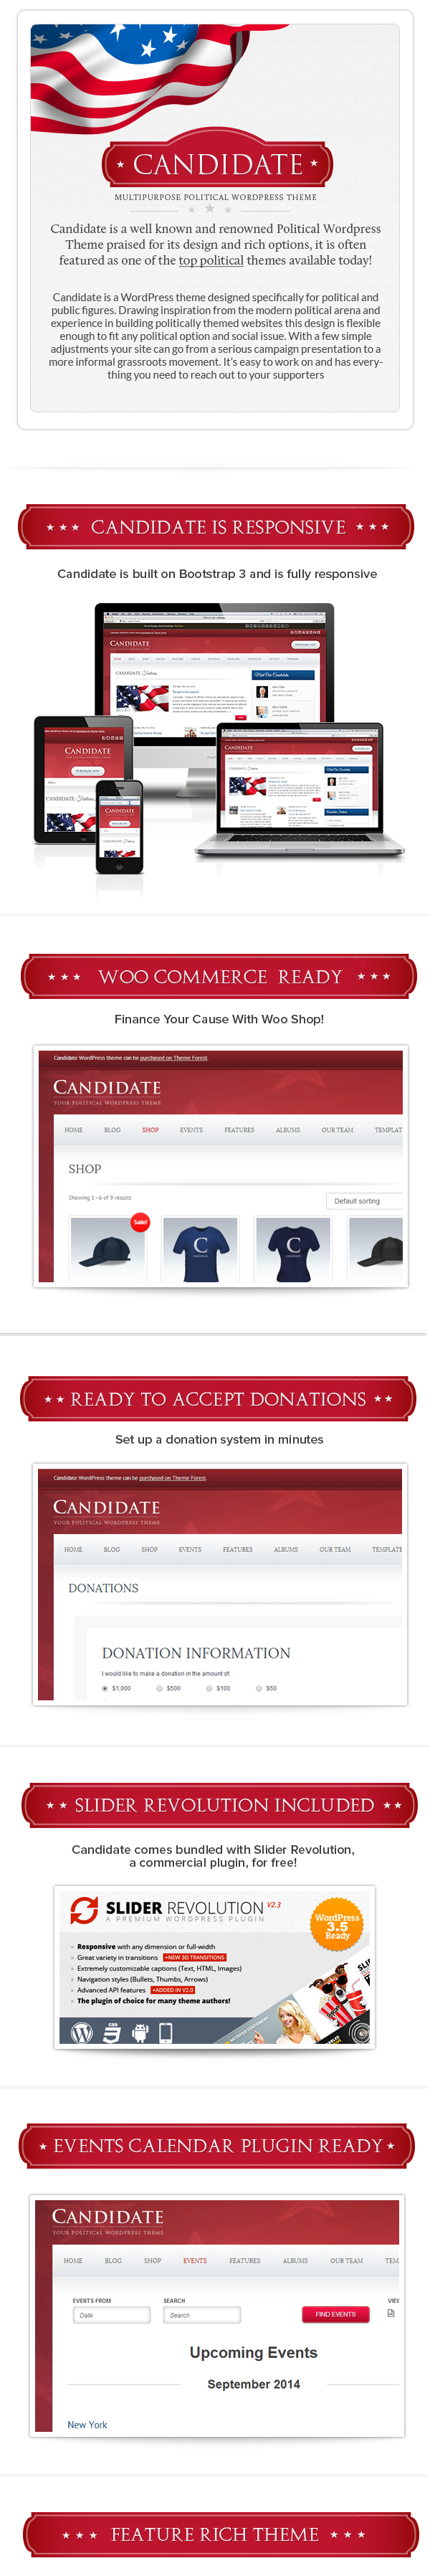 Candidate - Political WordPress Theme - 1